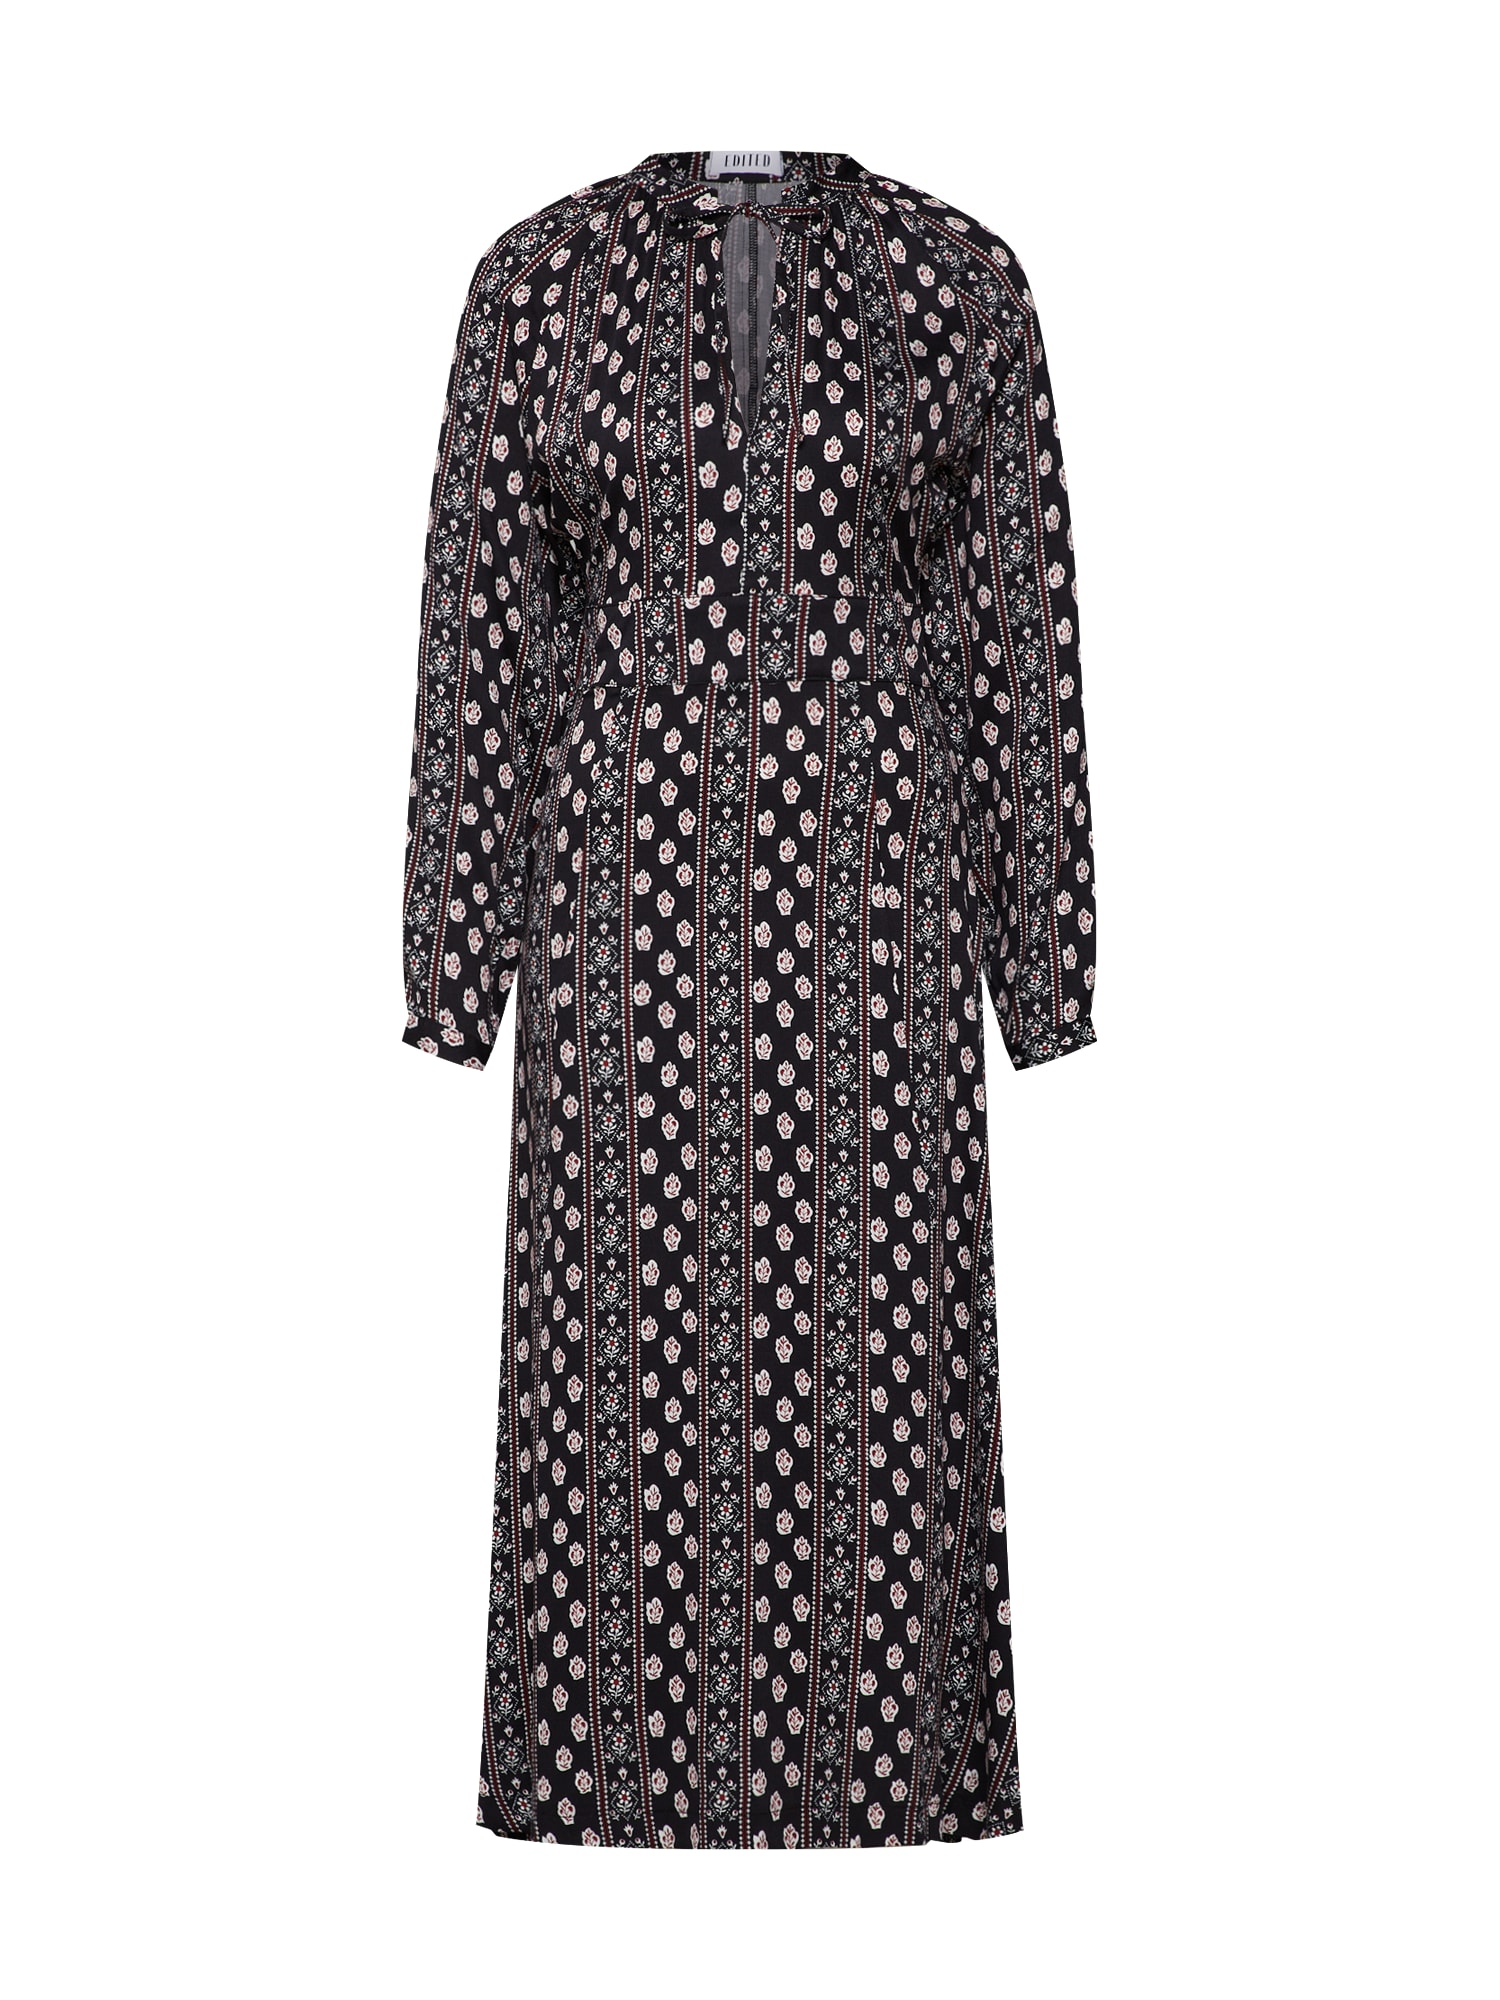 Šaty Cailin krémová bordó černá EDITED